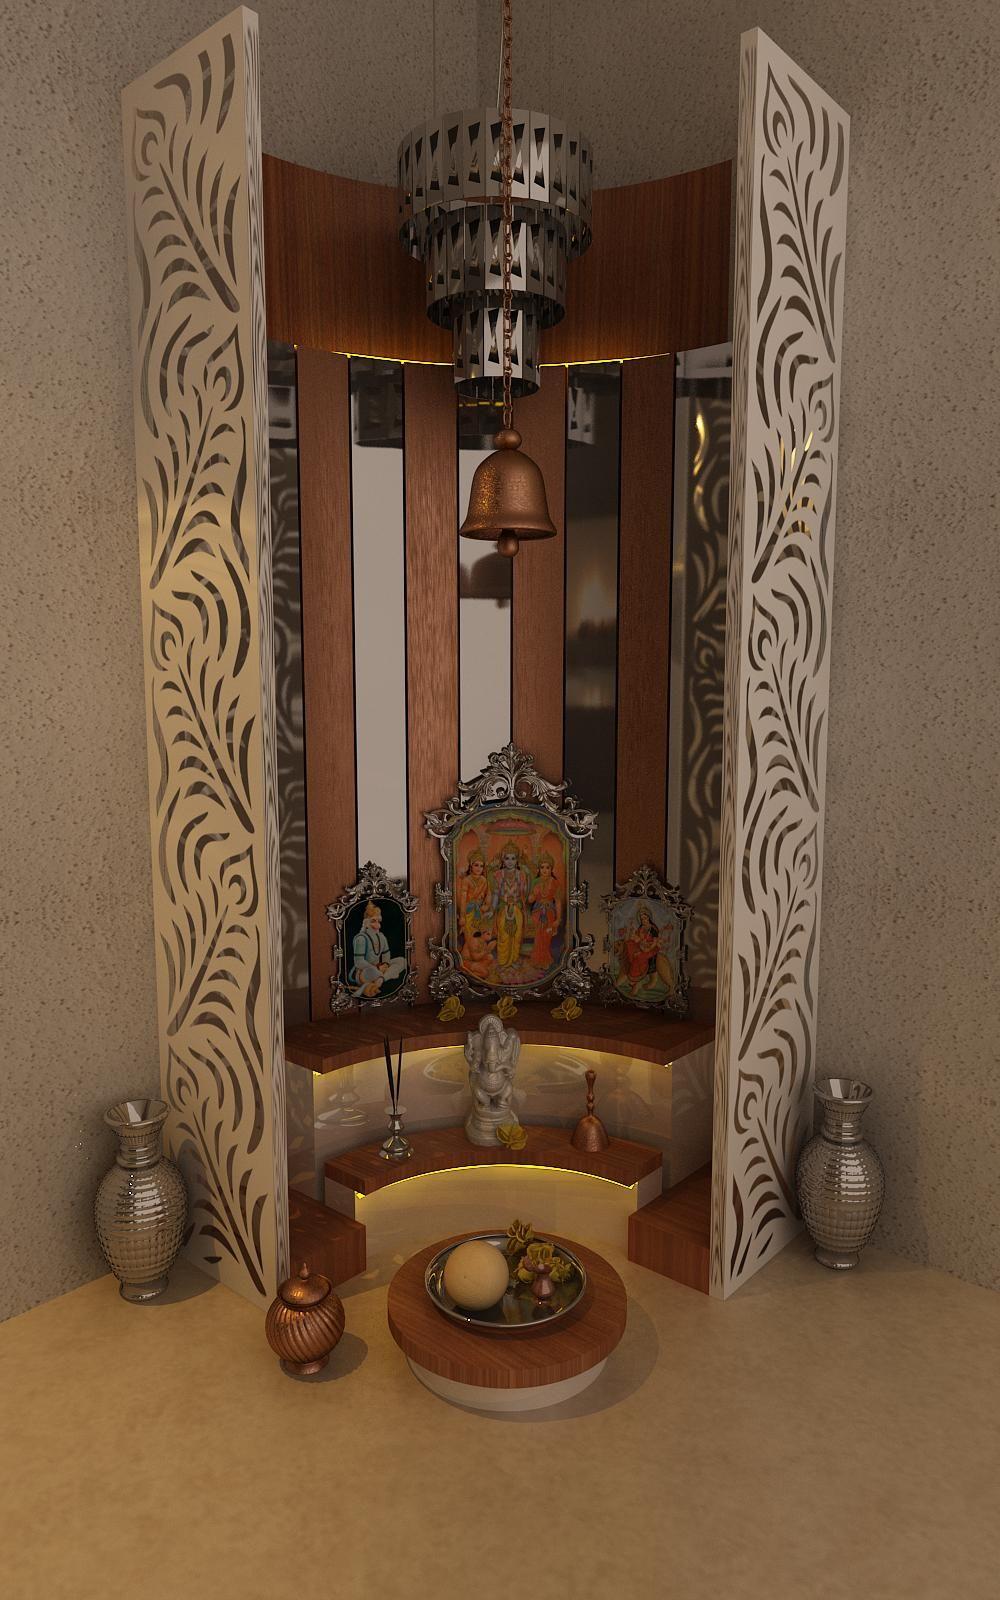 25 Best Images About Puja Room On Pinterest: Pooja Room By Kamlesh Maniya, Interior Designer In Surat